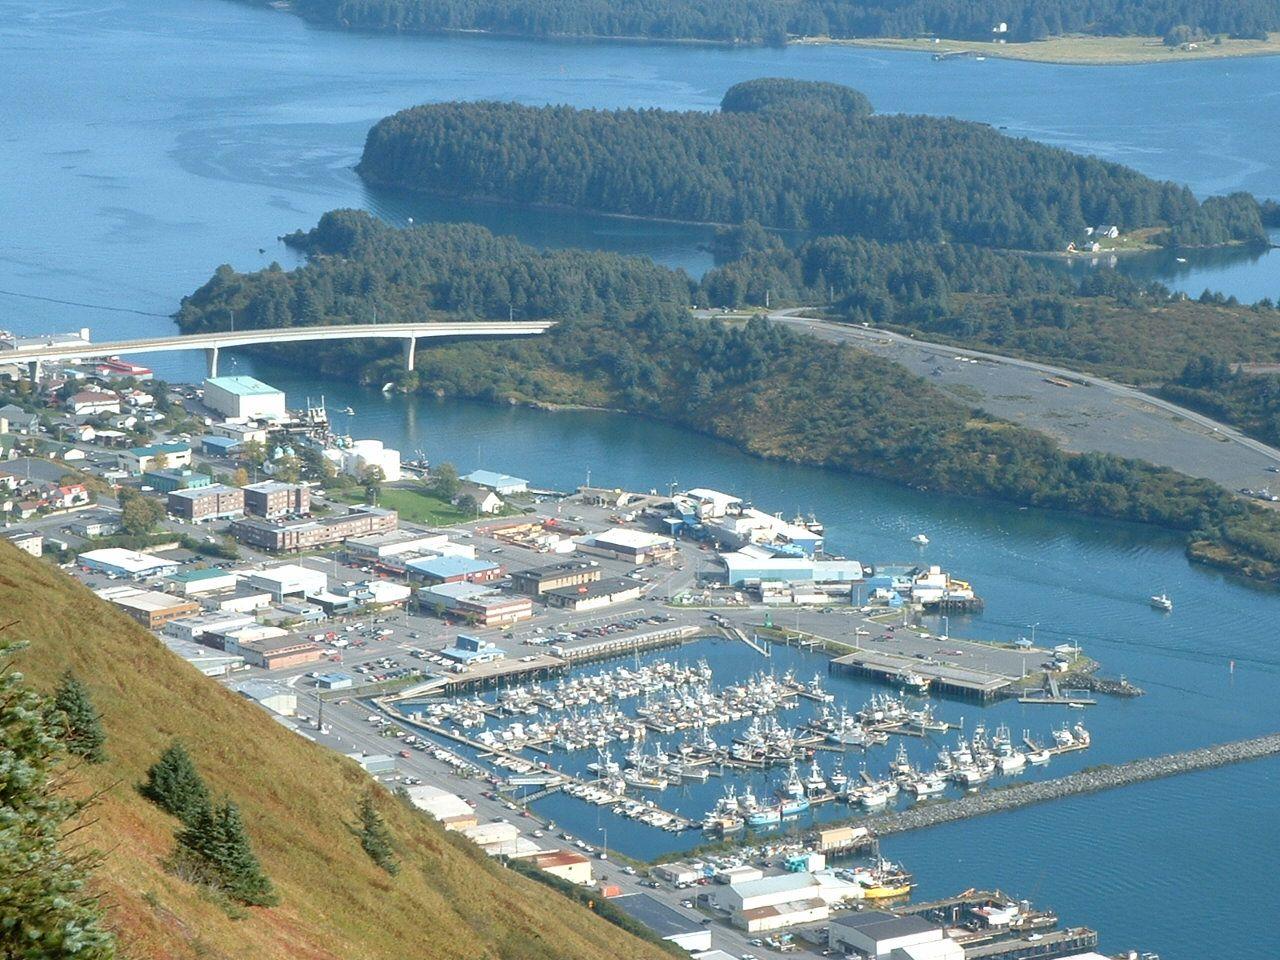 Kodiaks small boat harbor downtown travel spot